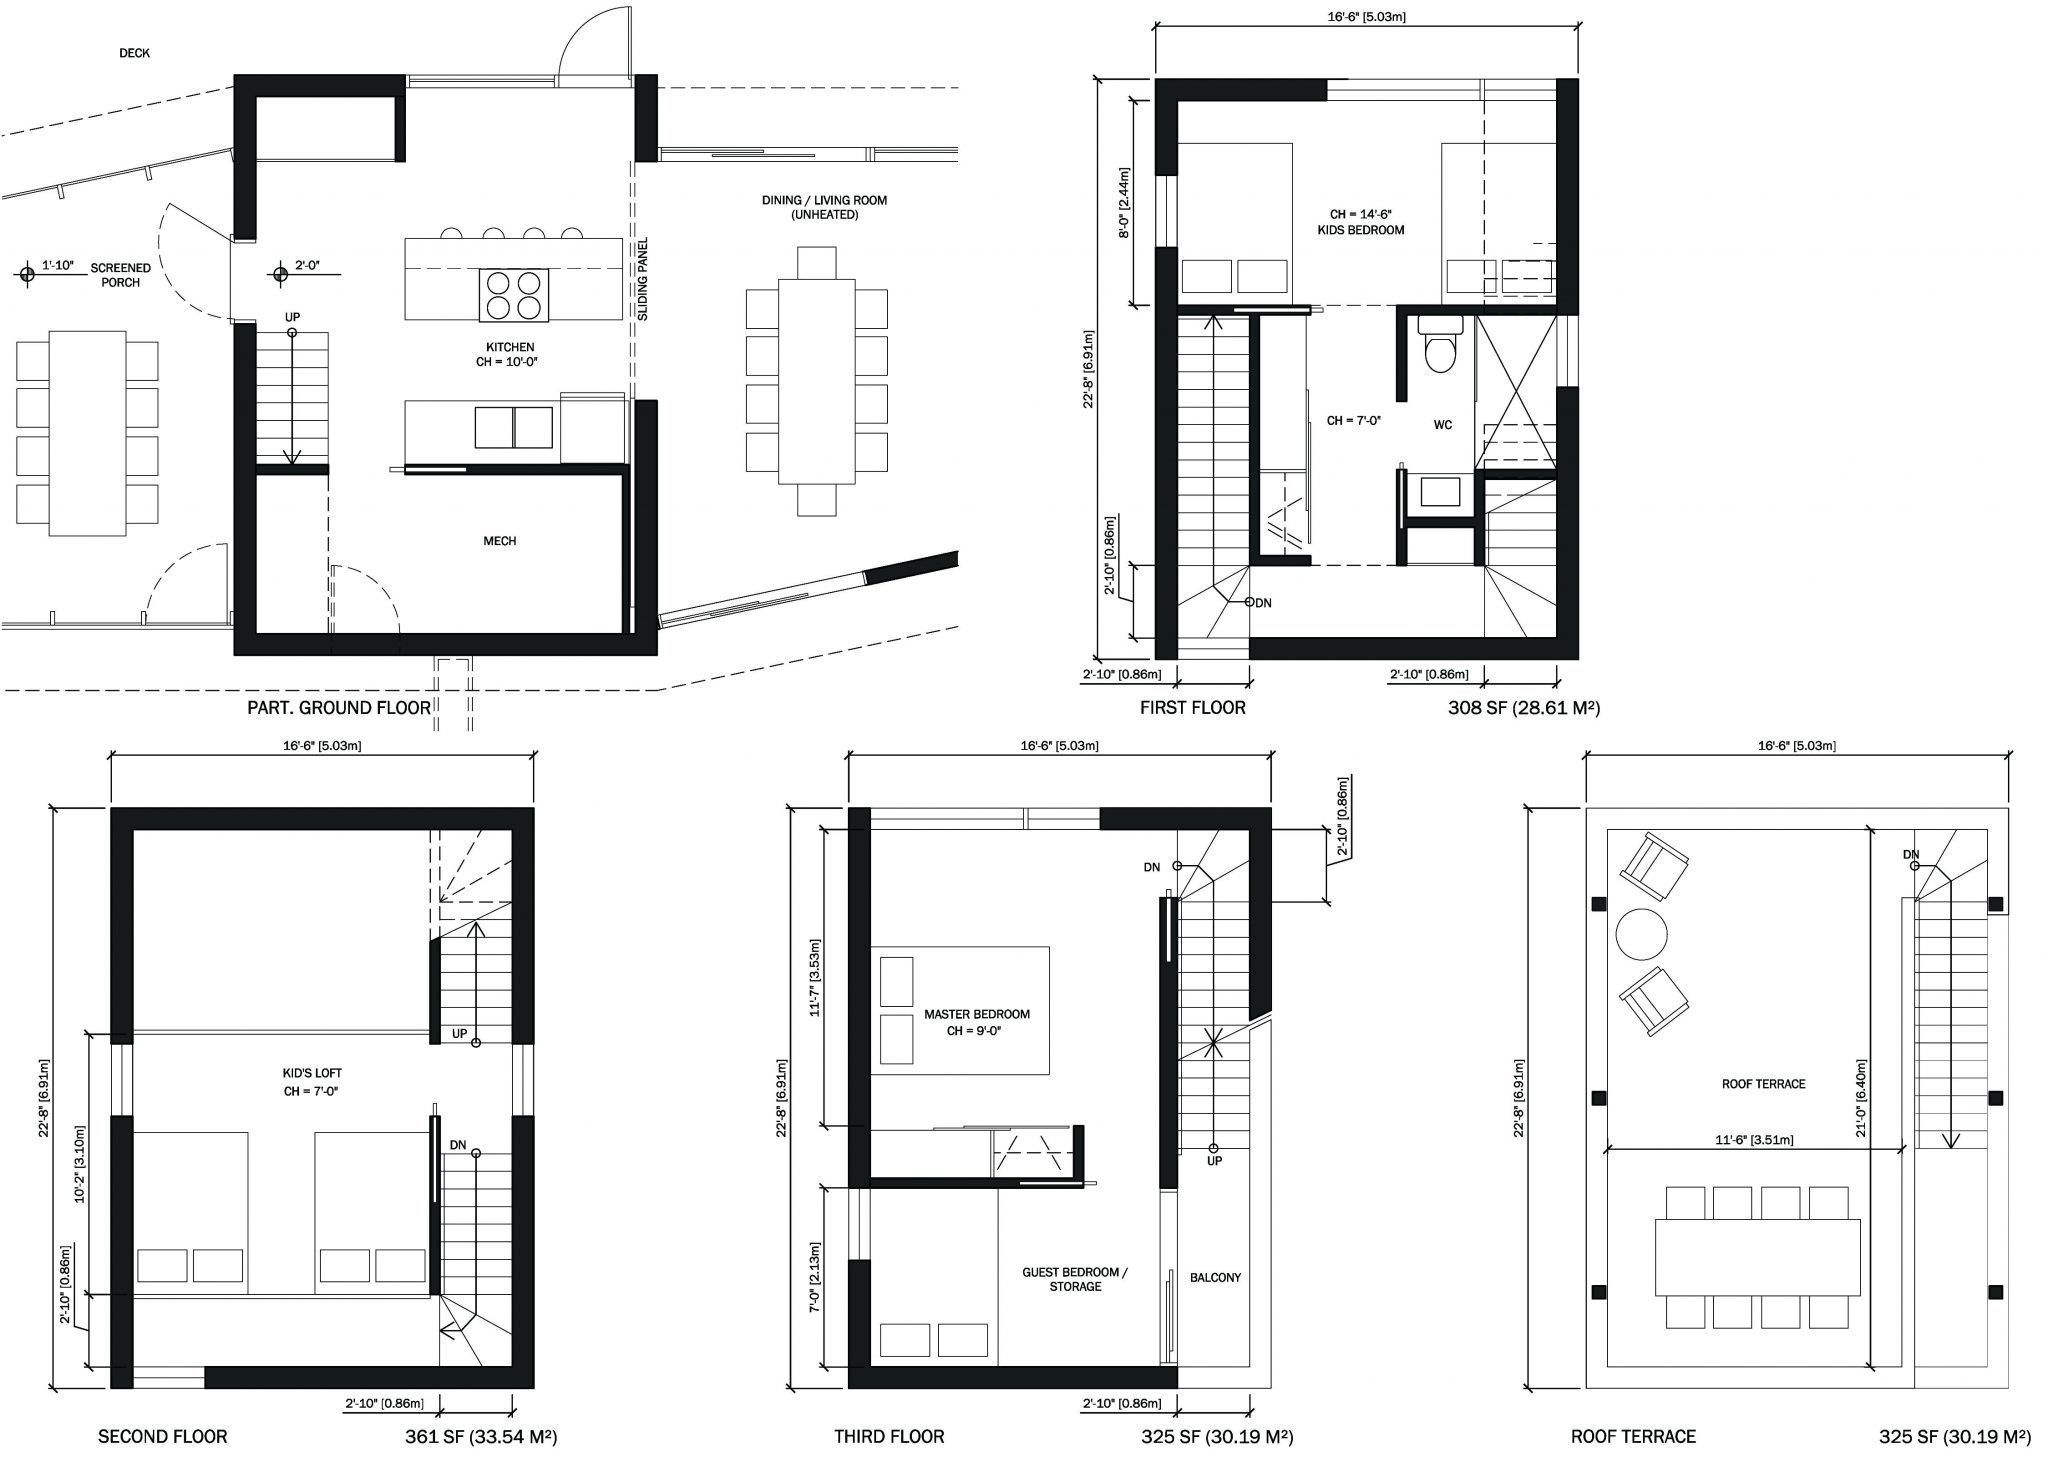 20 Diy Design How To Build A Mezzanine Floor Ideas At Cost Fomfest Com Mezzanine Floor Mezzanine Staircase Design